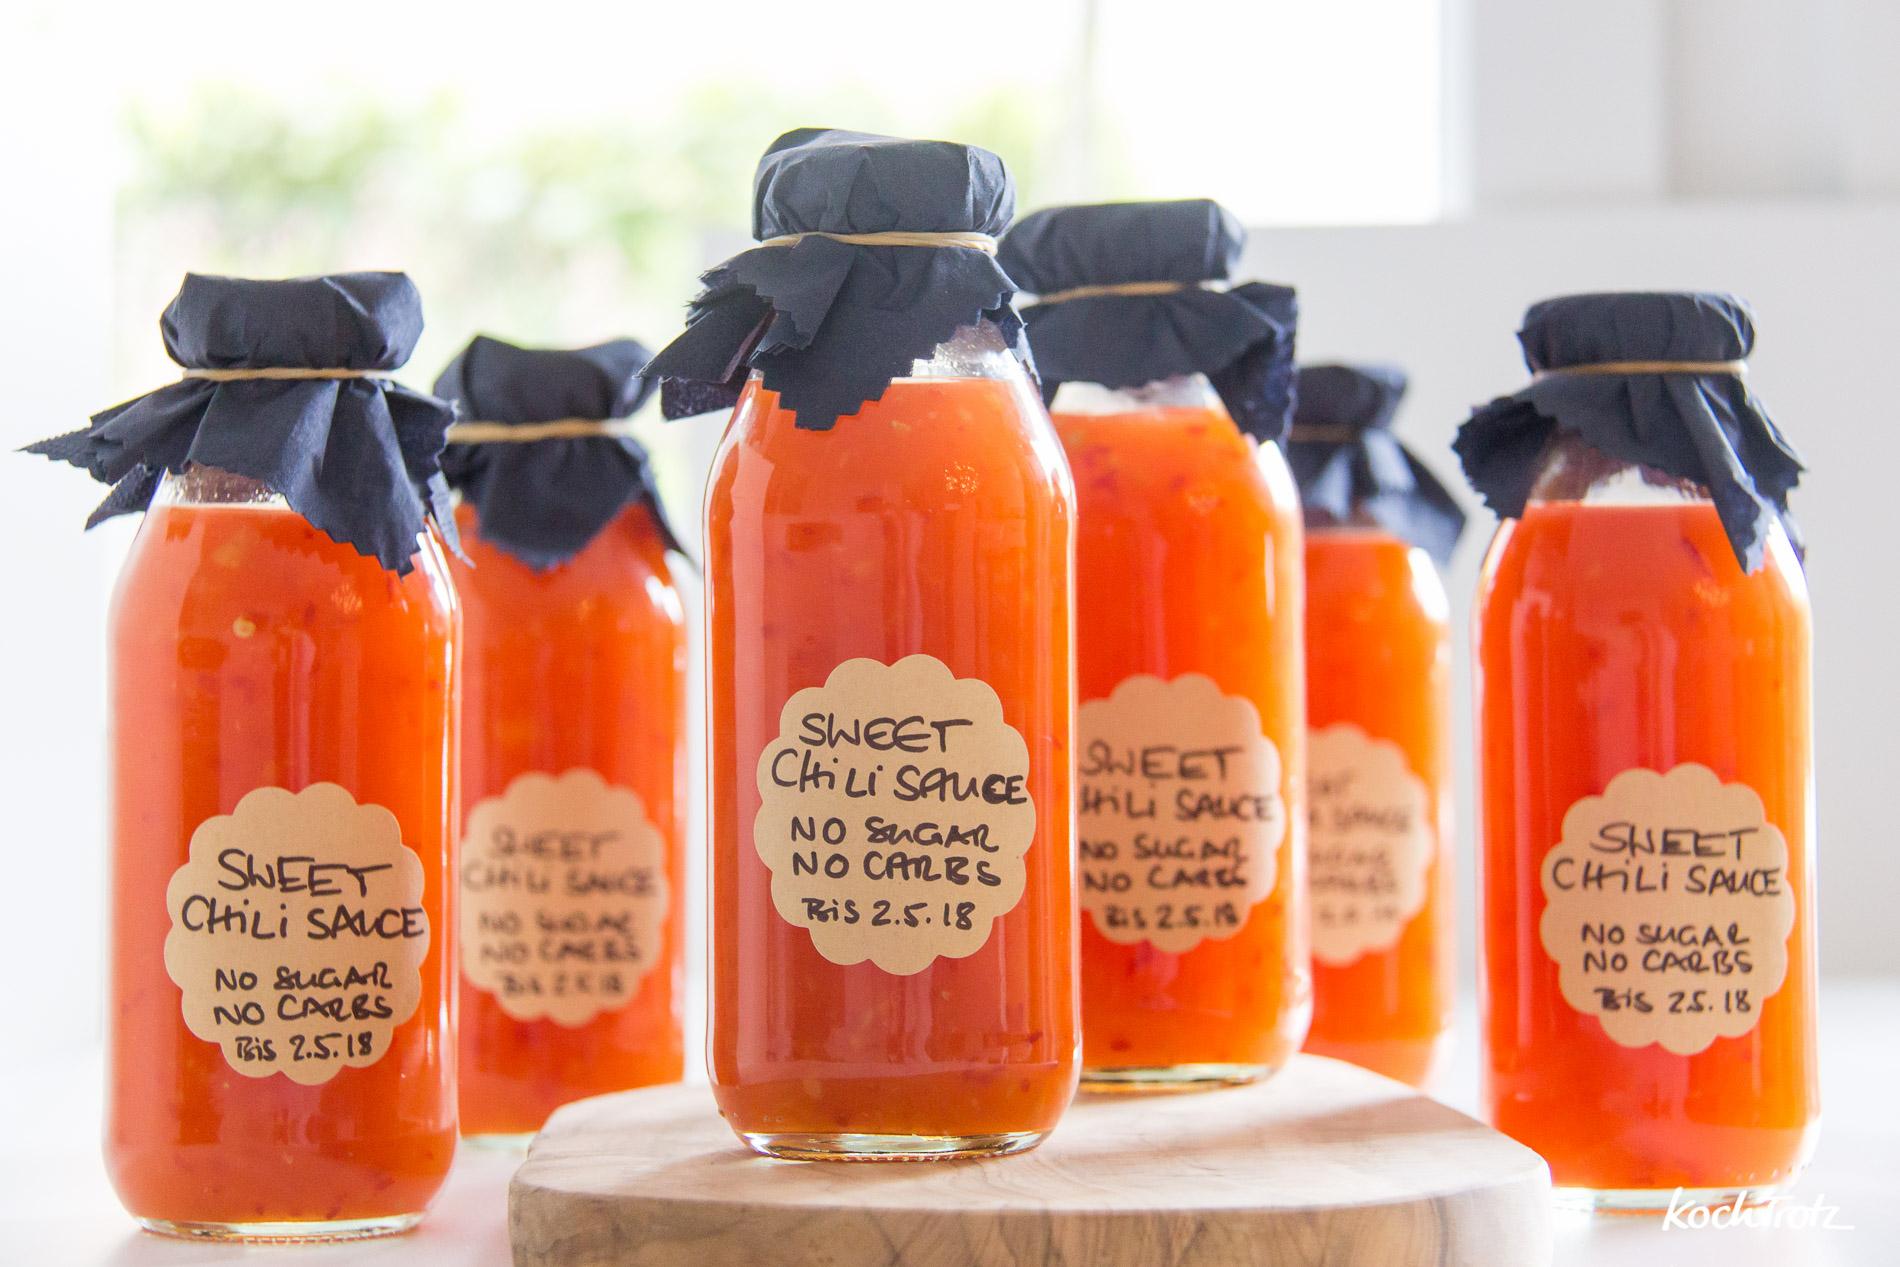 low-carb Sweet Chilisauce | Thermomix-Rezept | zuckerfrei | schmeckt wie das Original